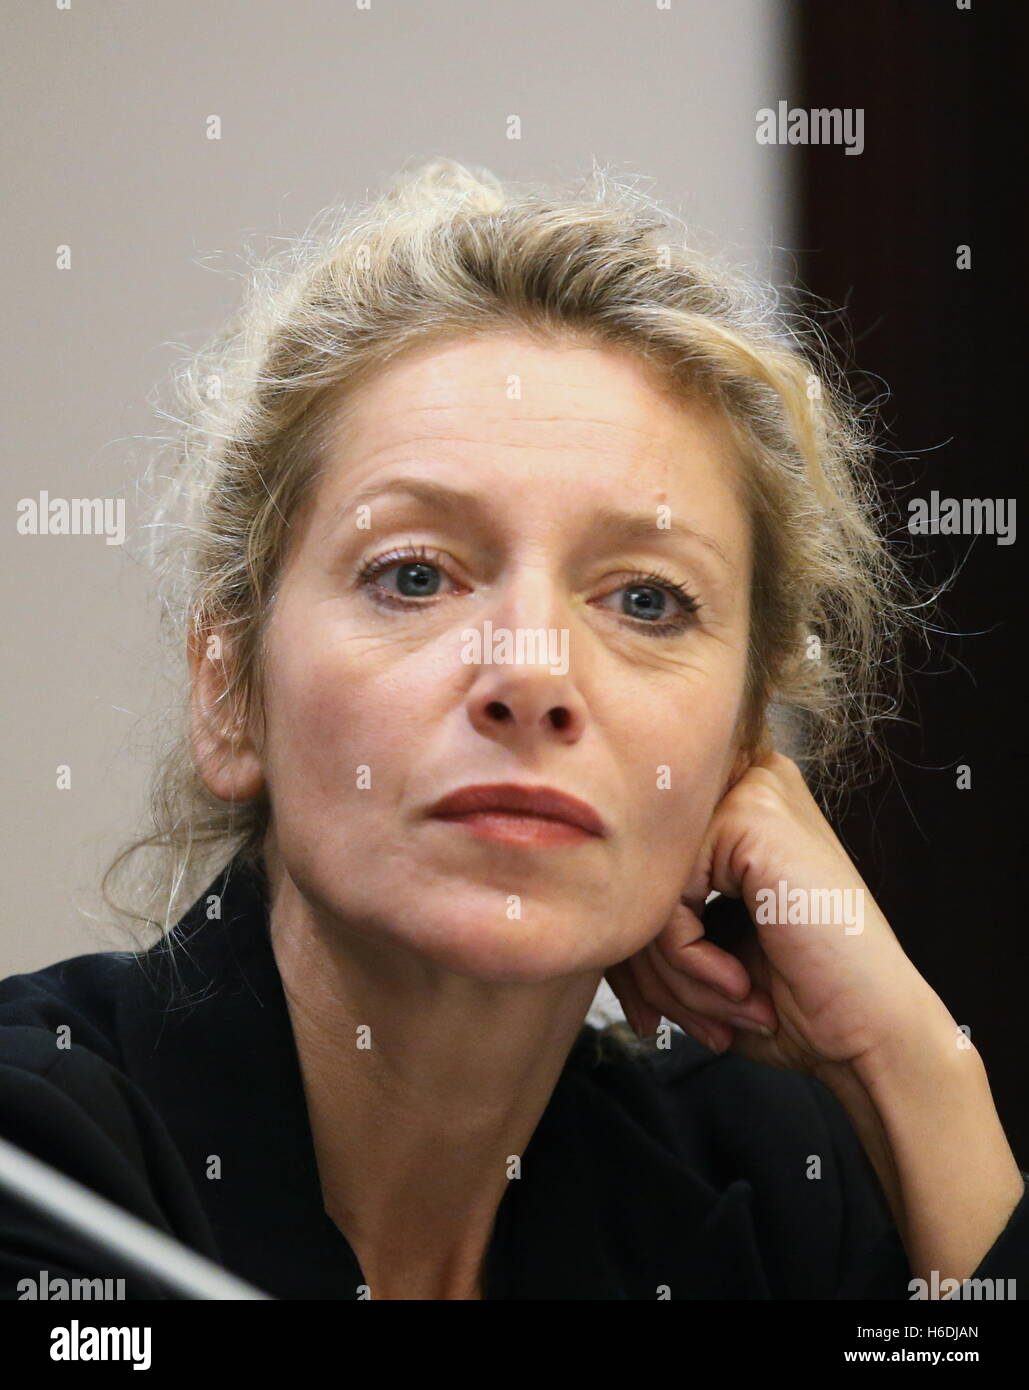 Elsa Lepoivre nude 177